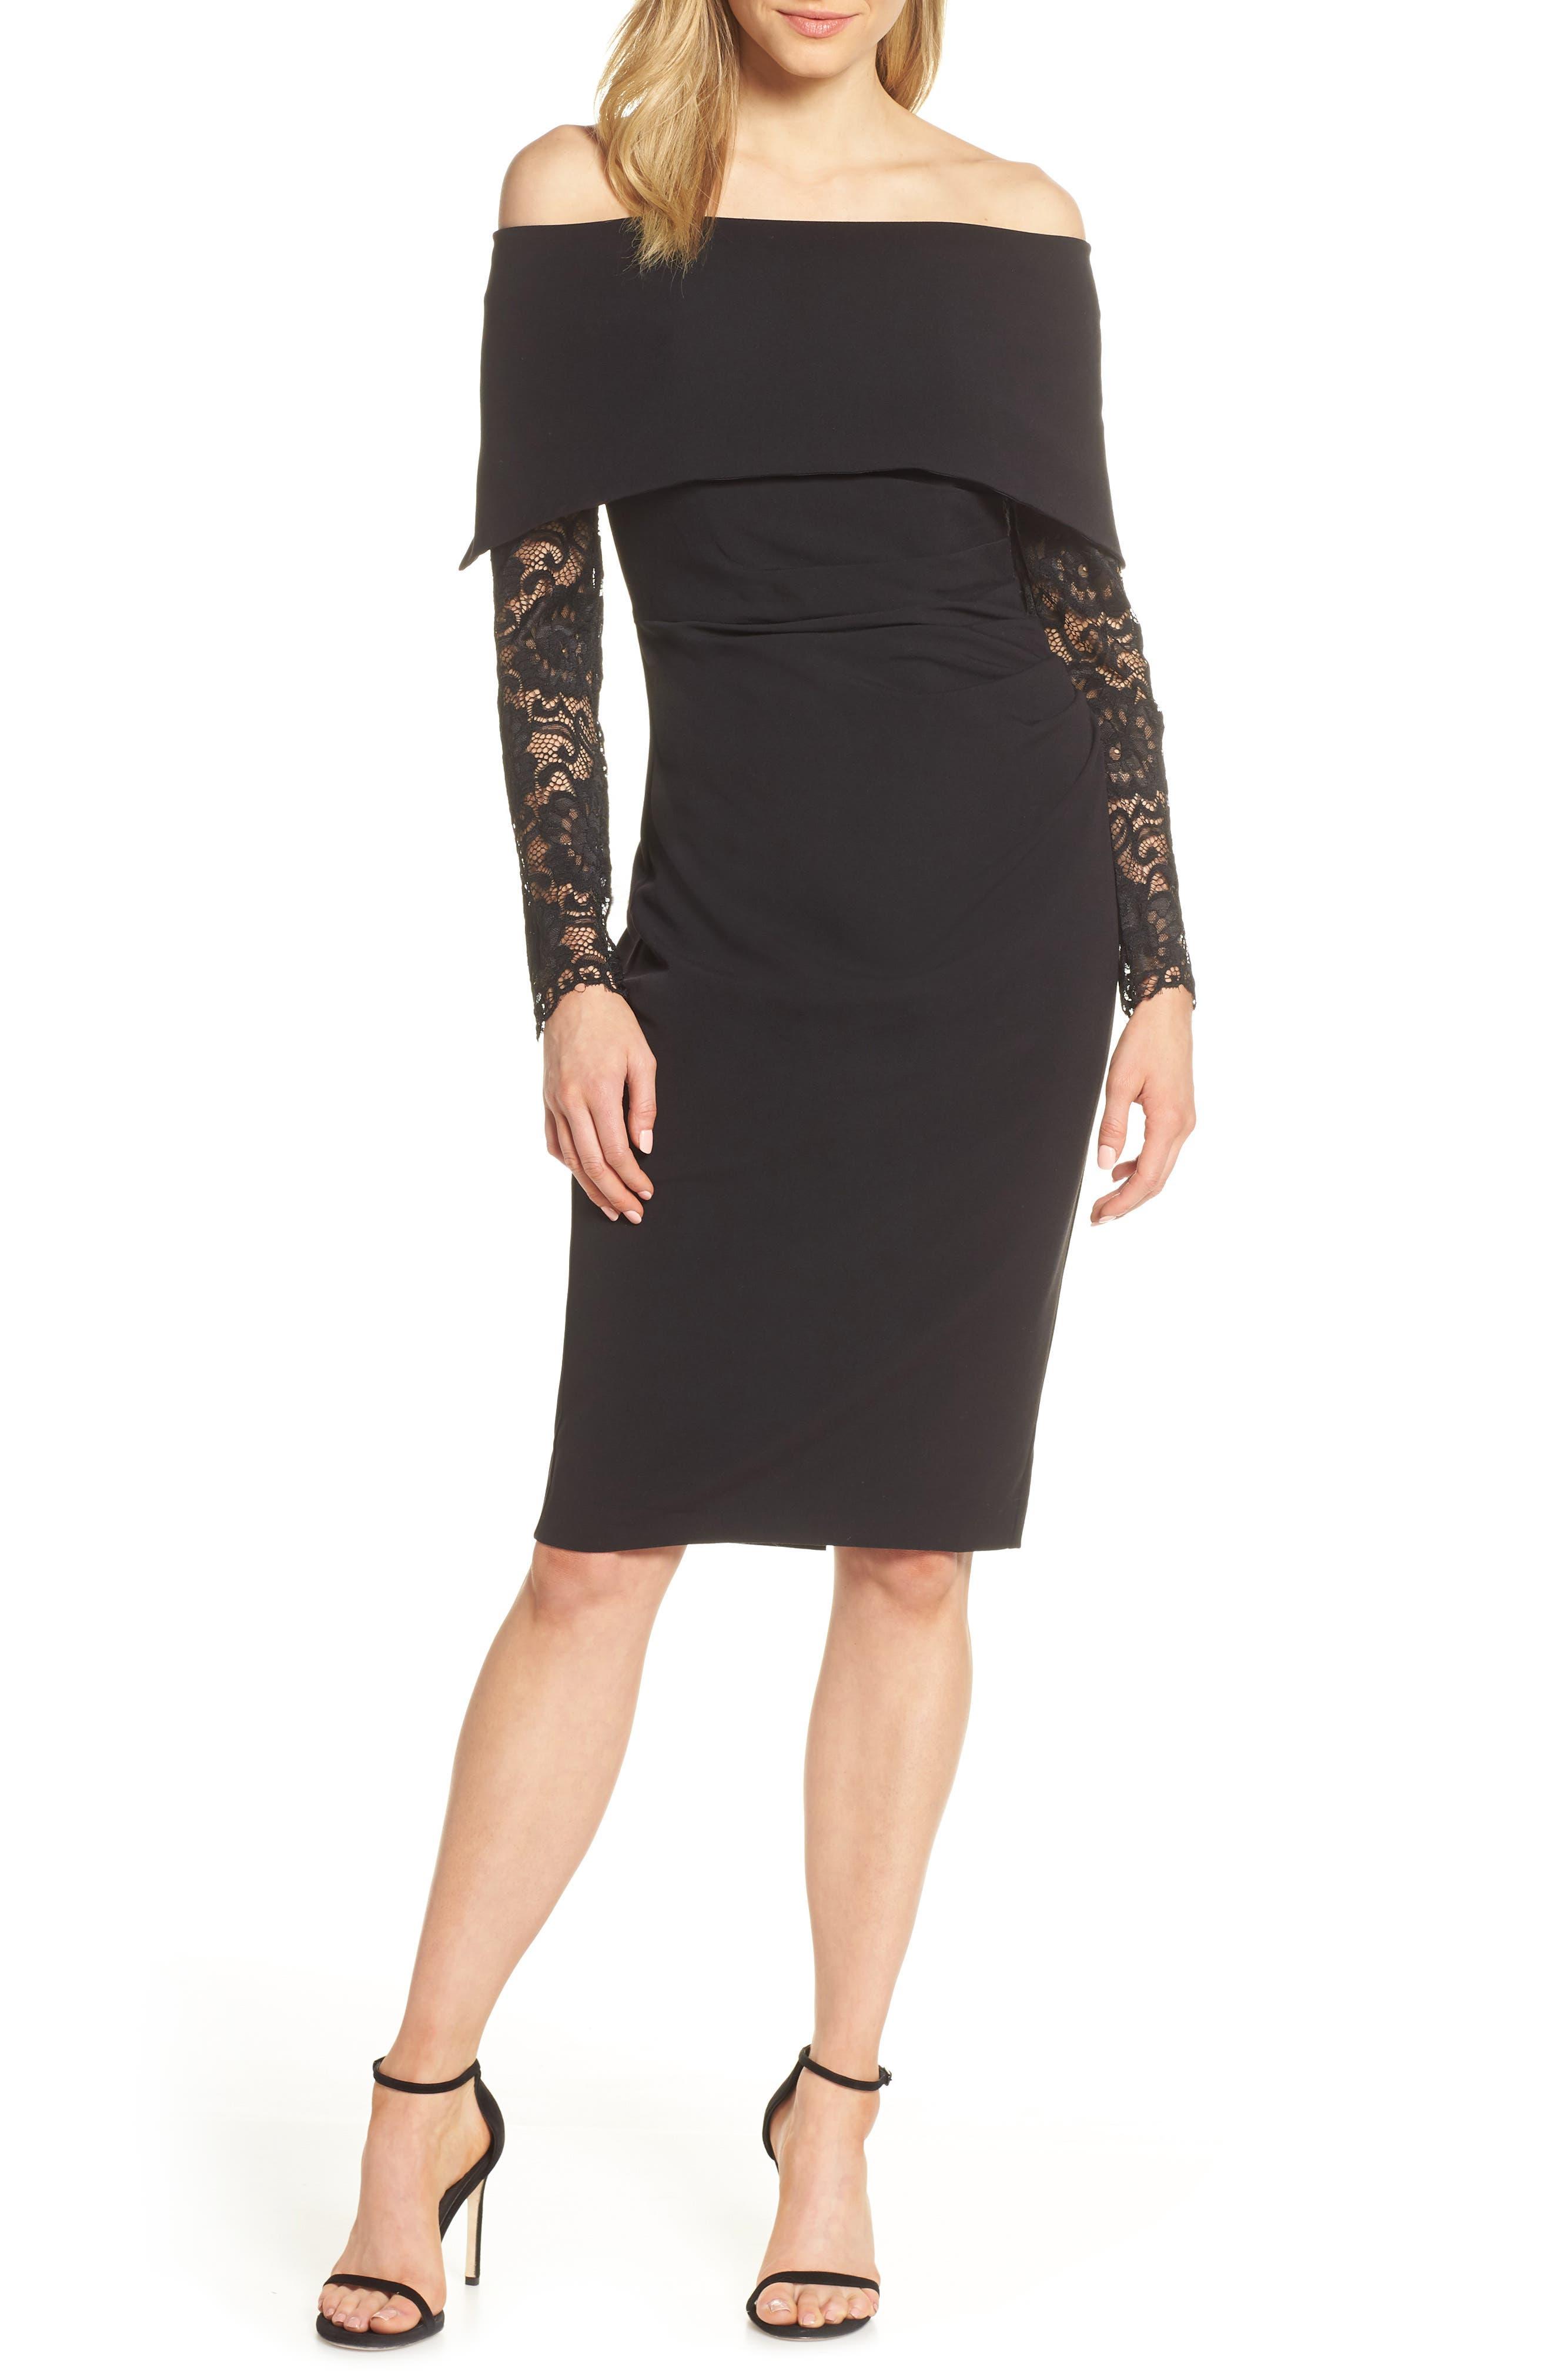 Vince Camuto Lace Sleeve Off The Shoulder Sheath Dress, Black